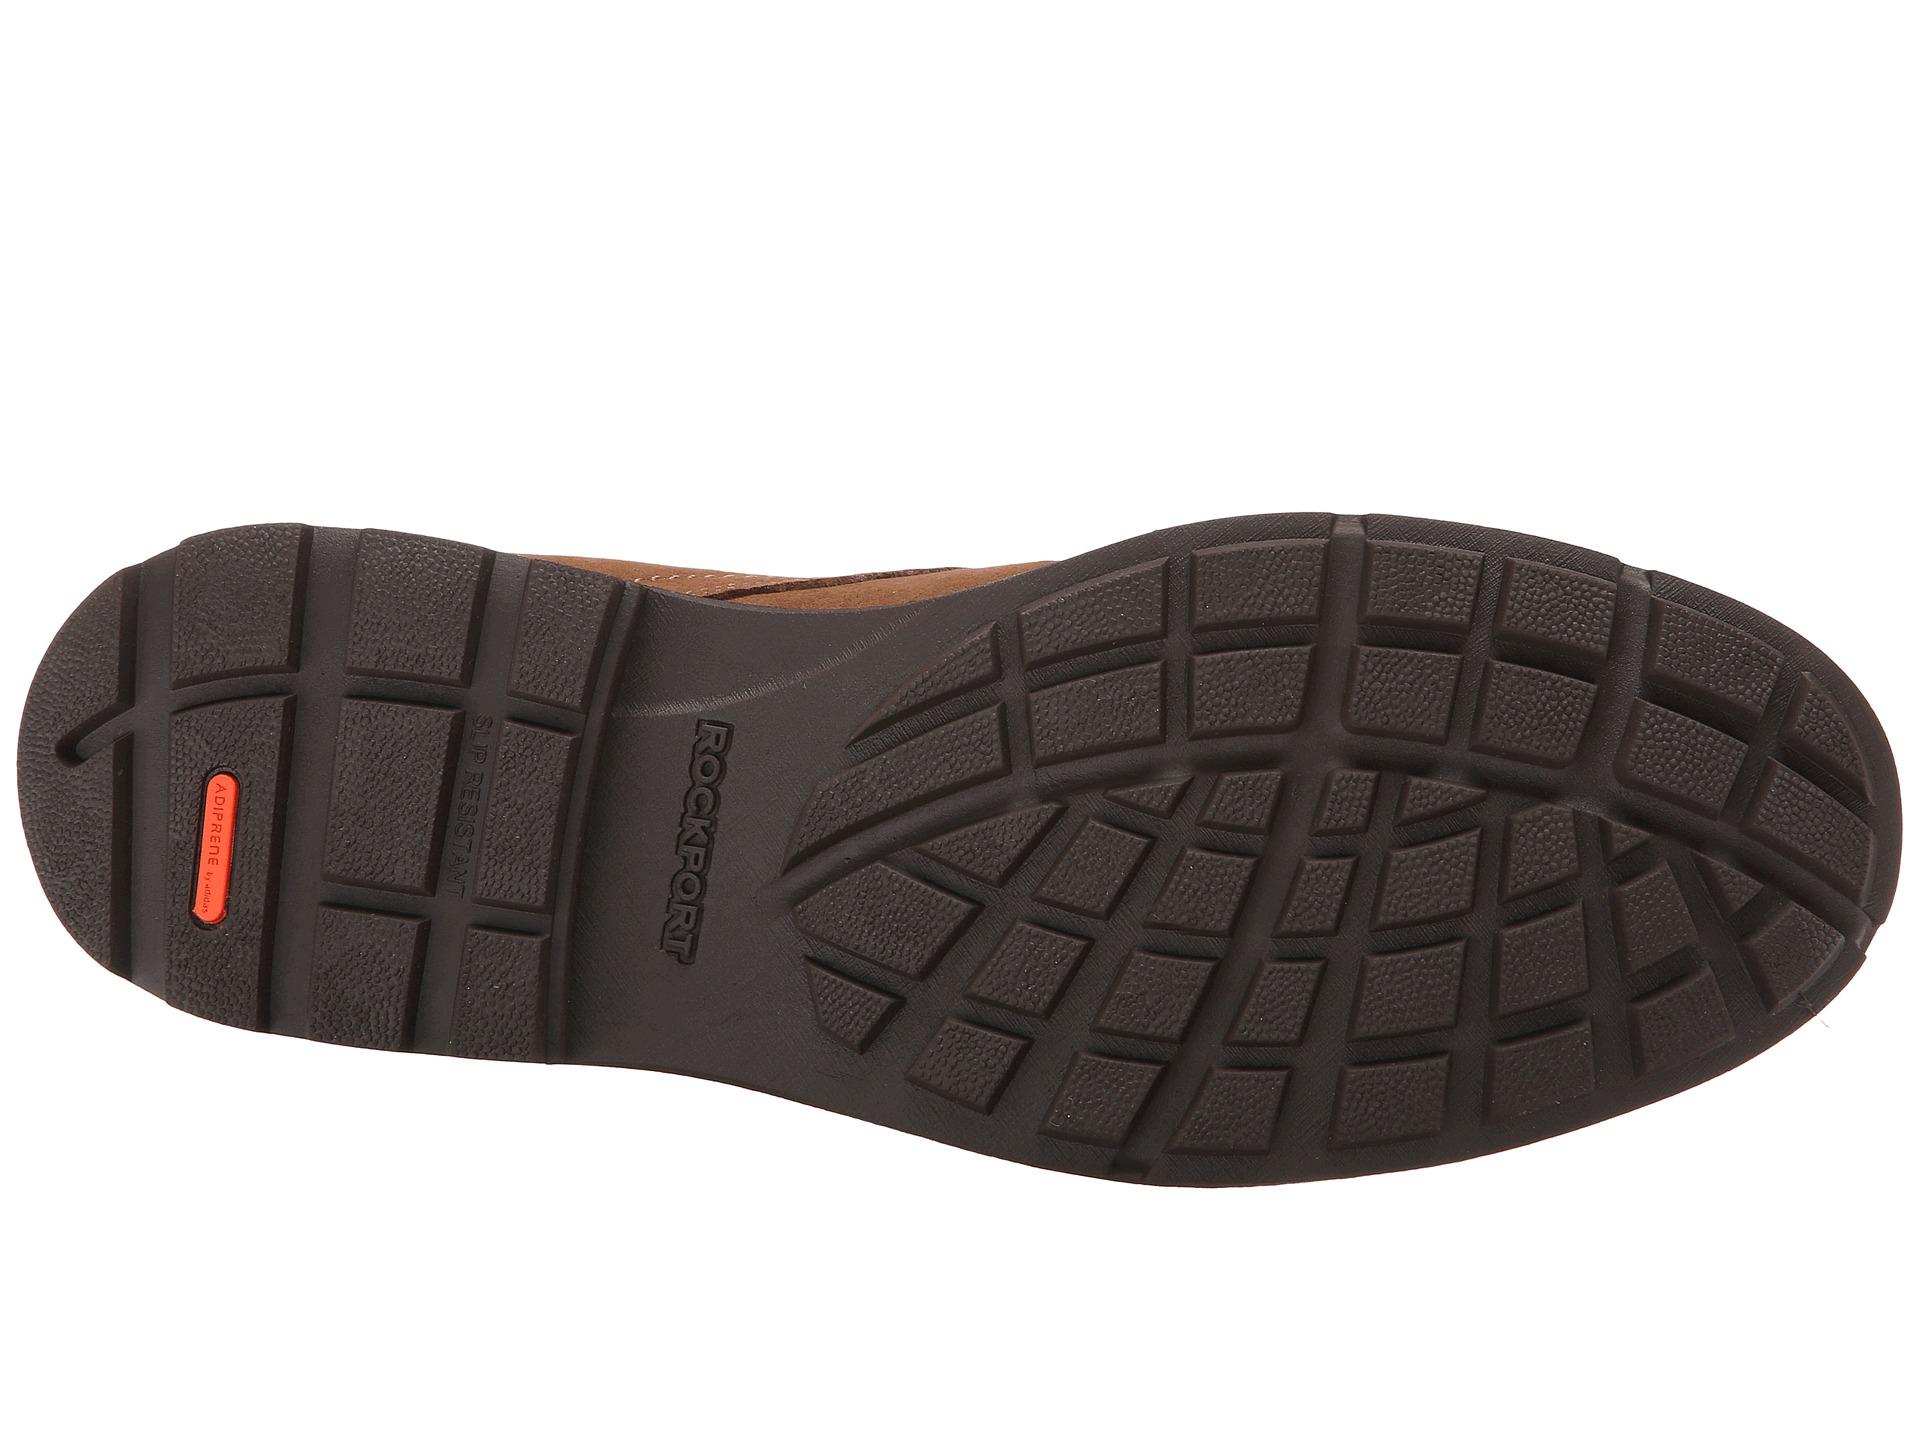 Rockport Rugged Bucks Waterproof Boot Zappos Com Free